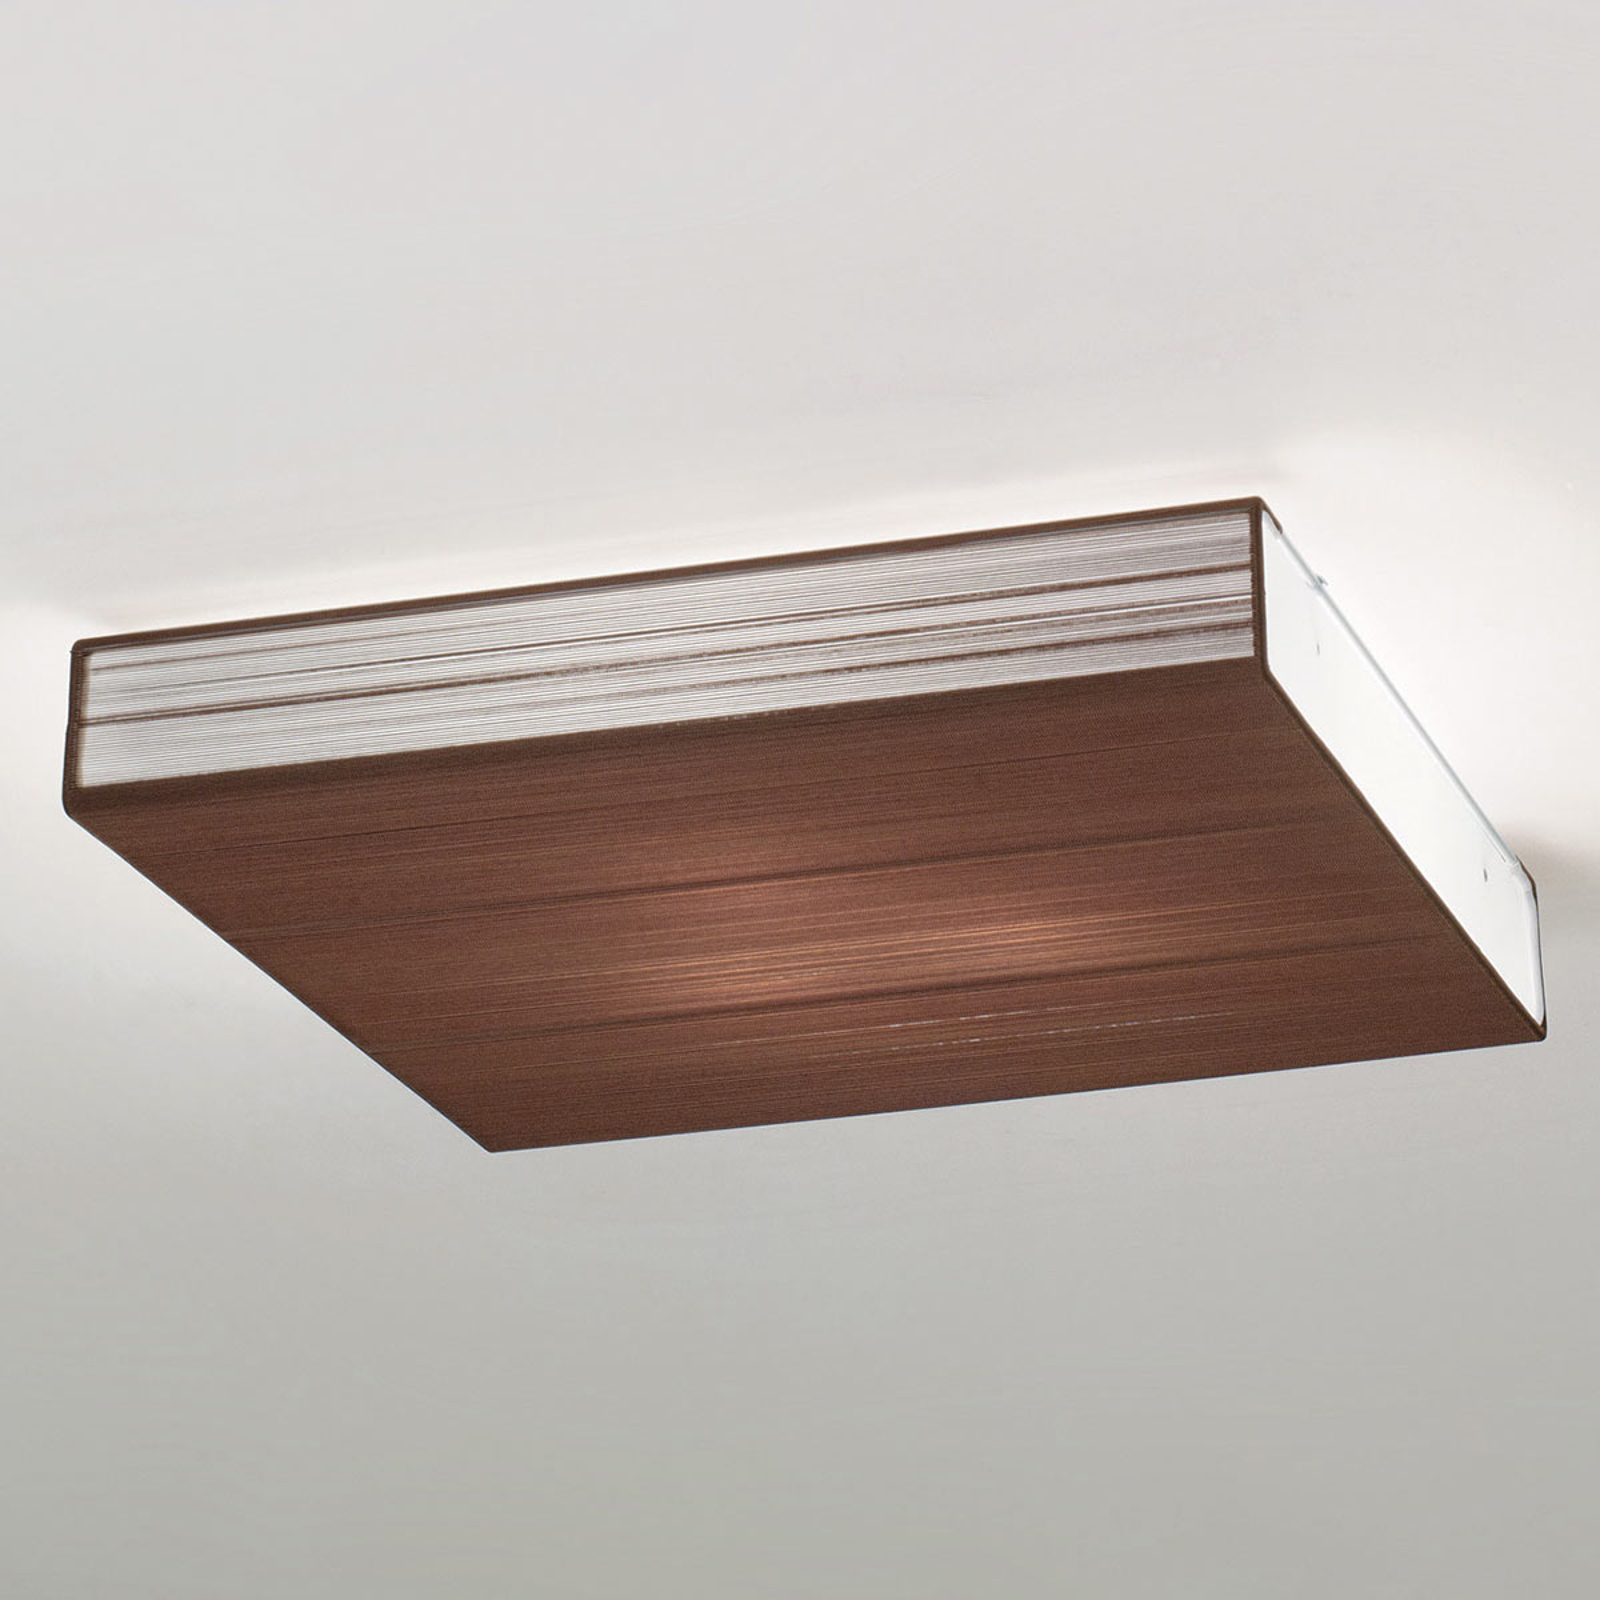 Axolight Clavius plafondlamp 60 cm tabak